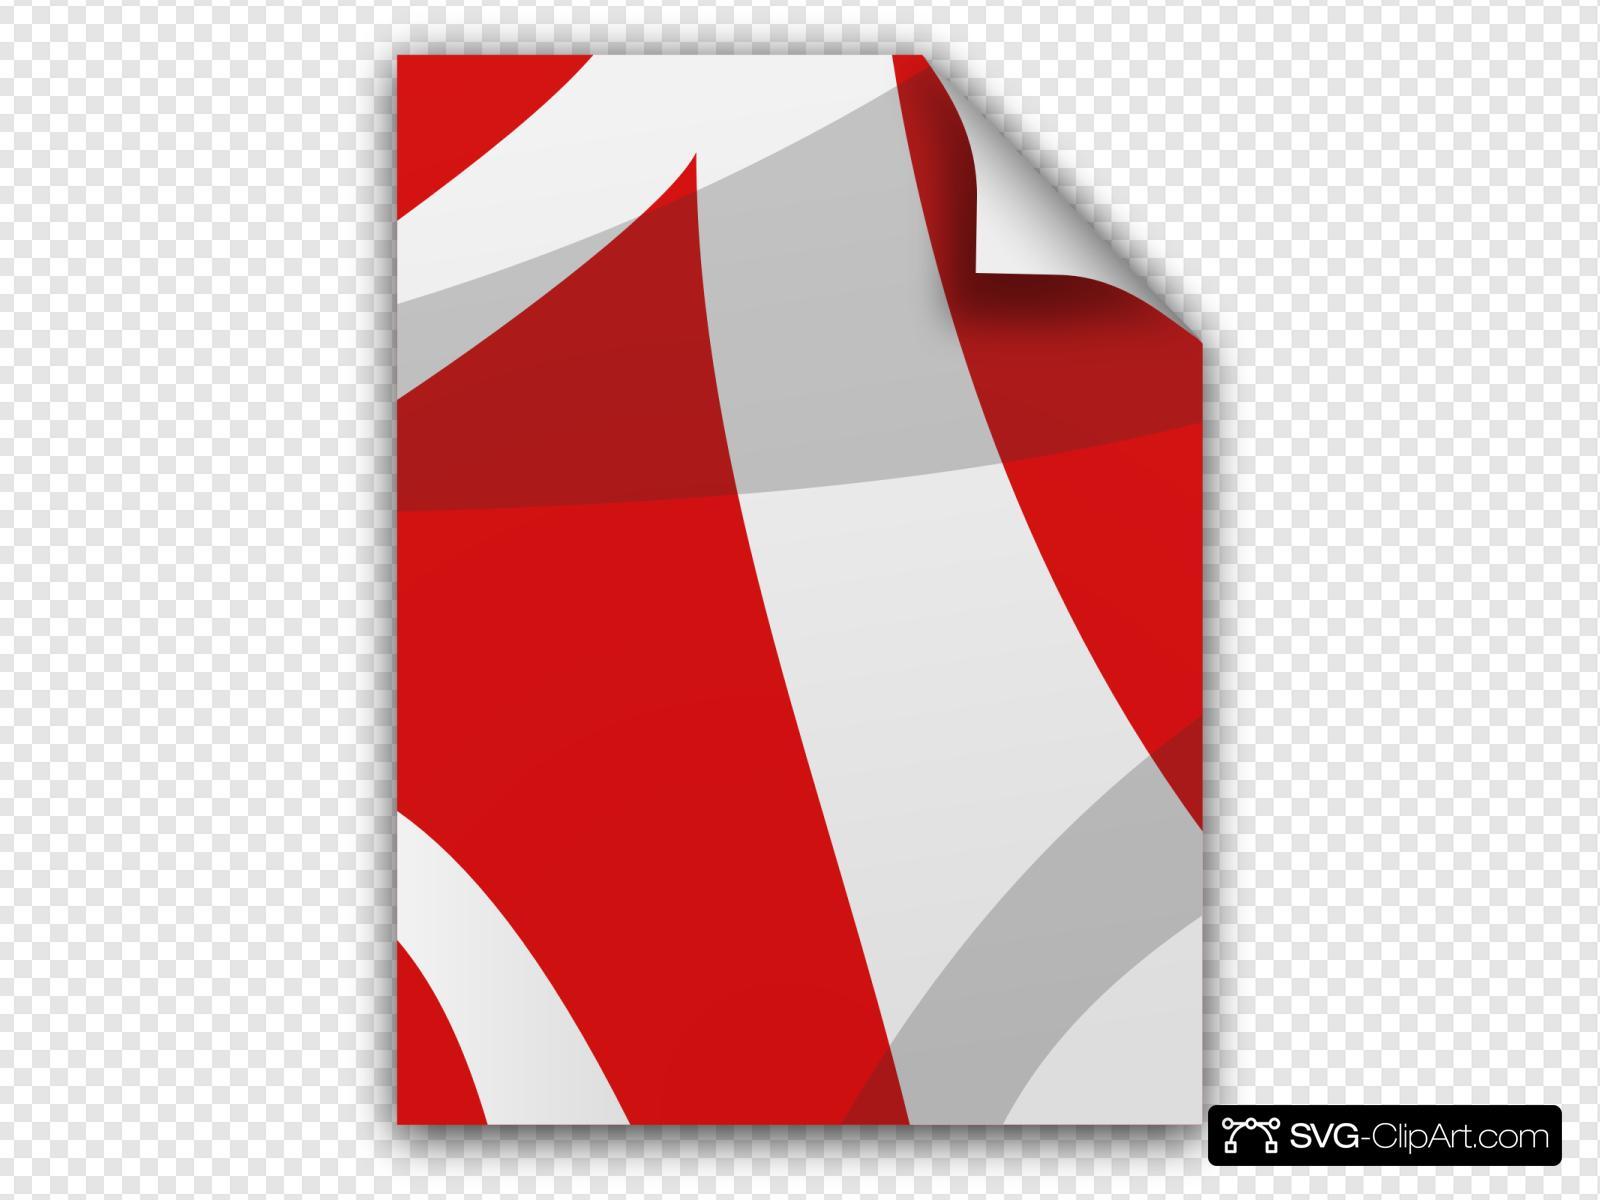 Application X Pdf Clip art, Icon and SVG.